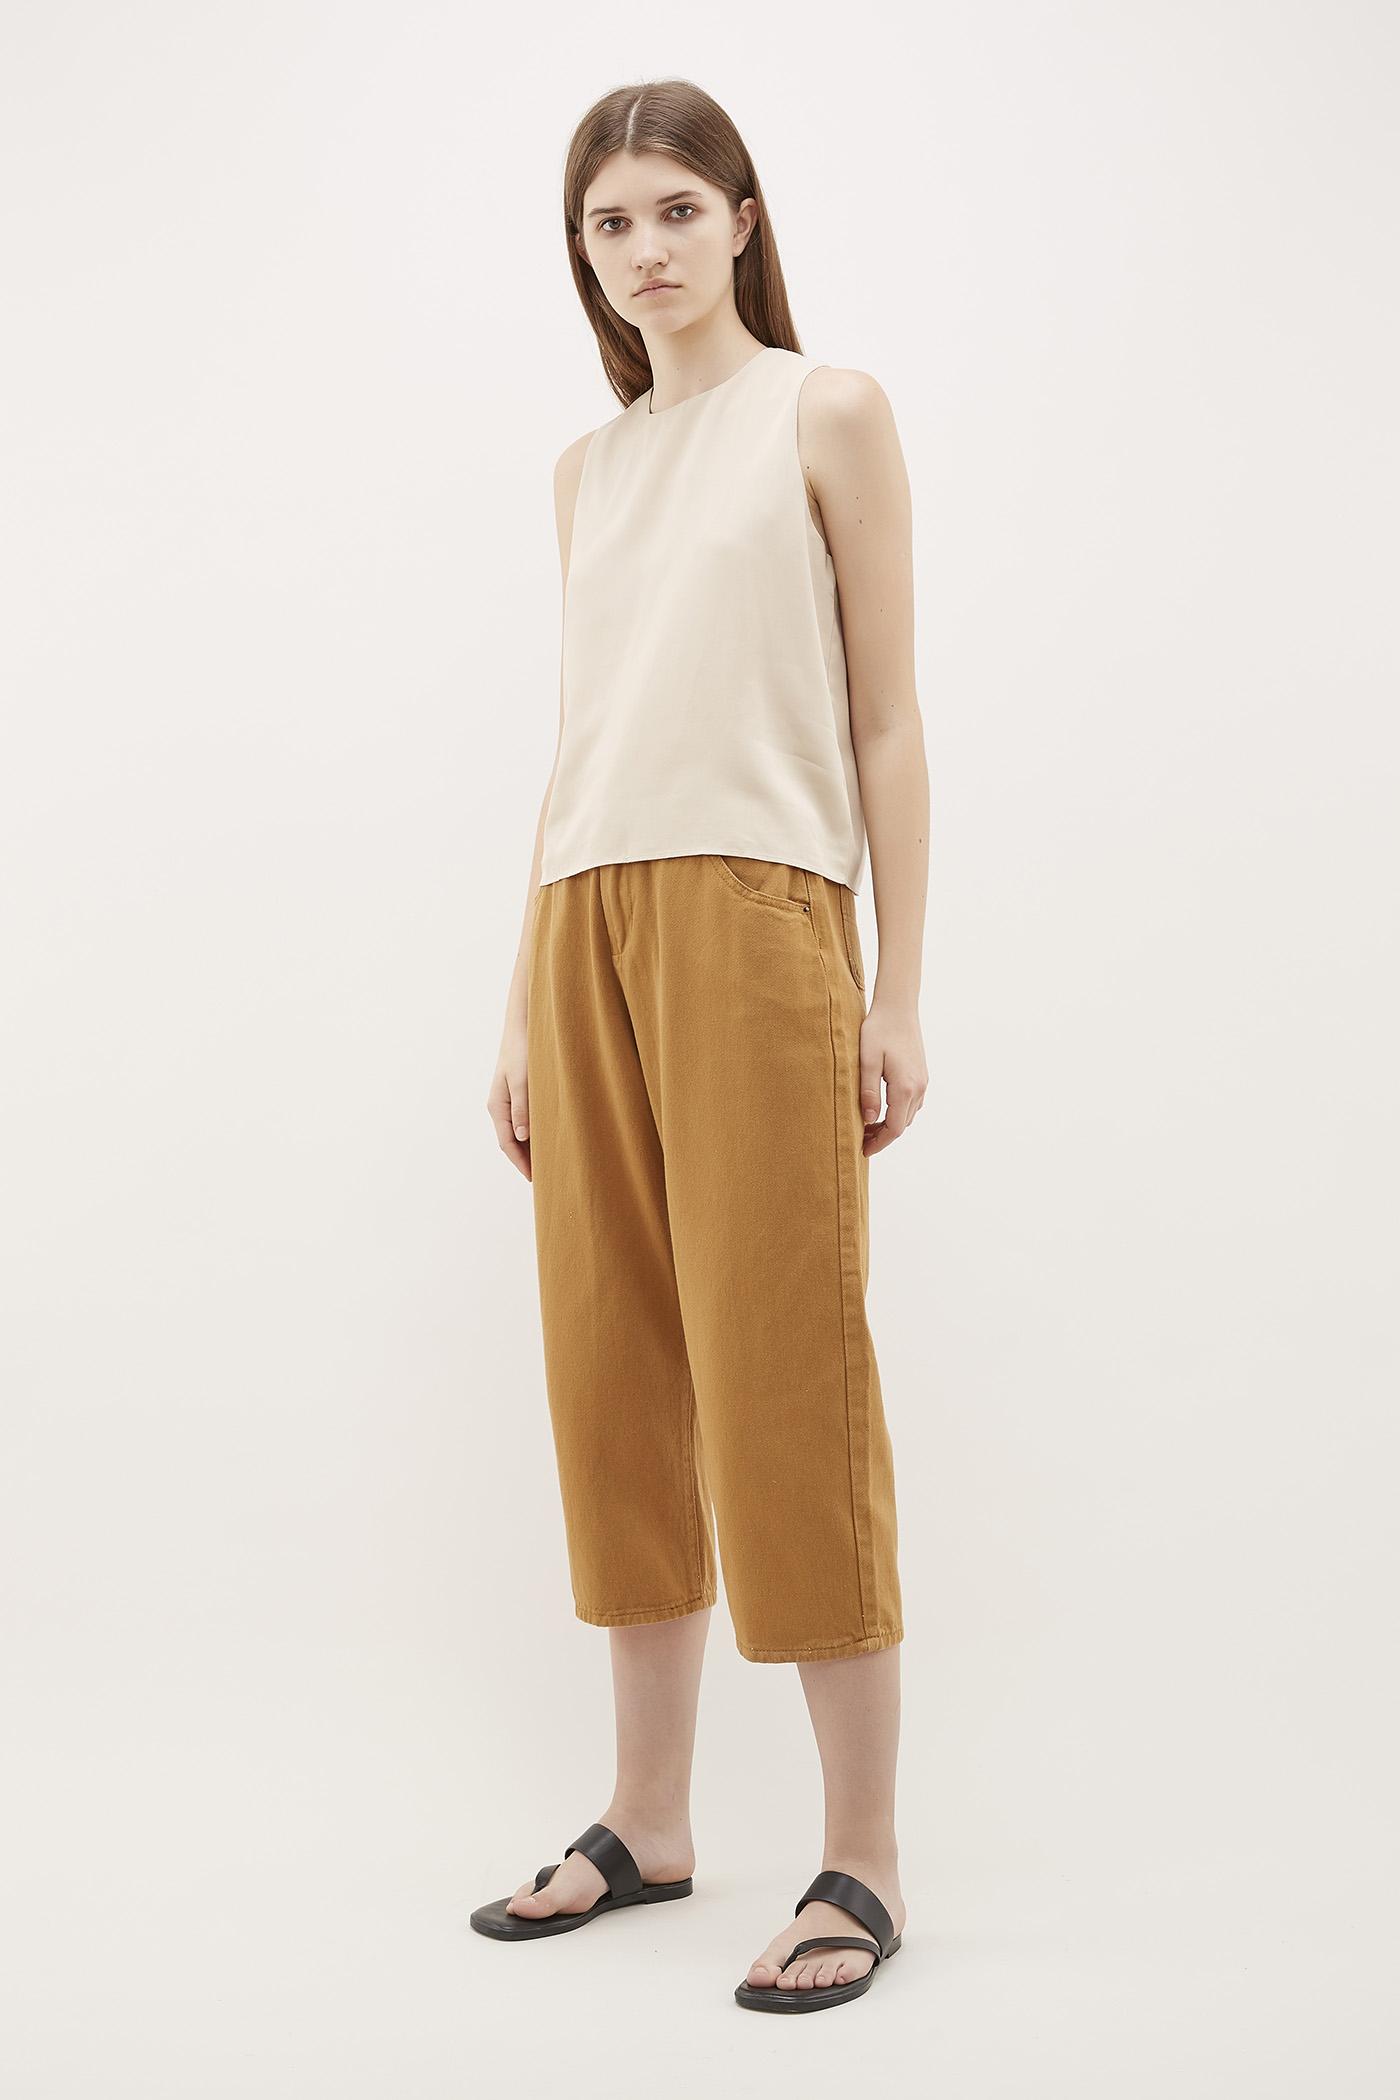 Radley High-Waisted Pants